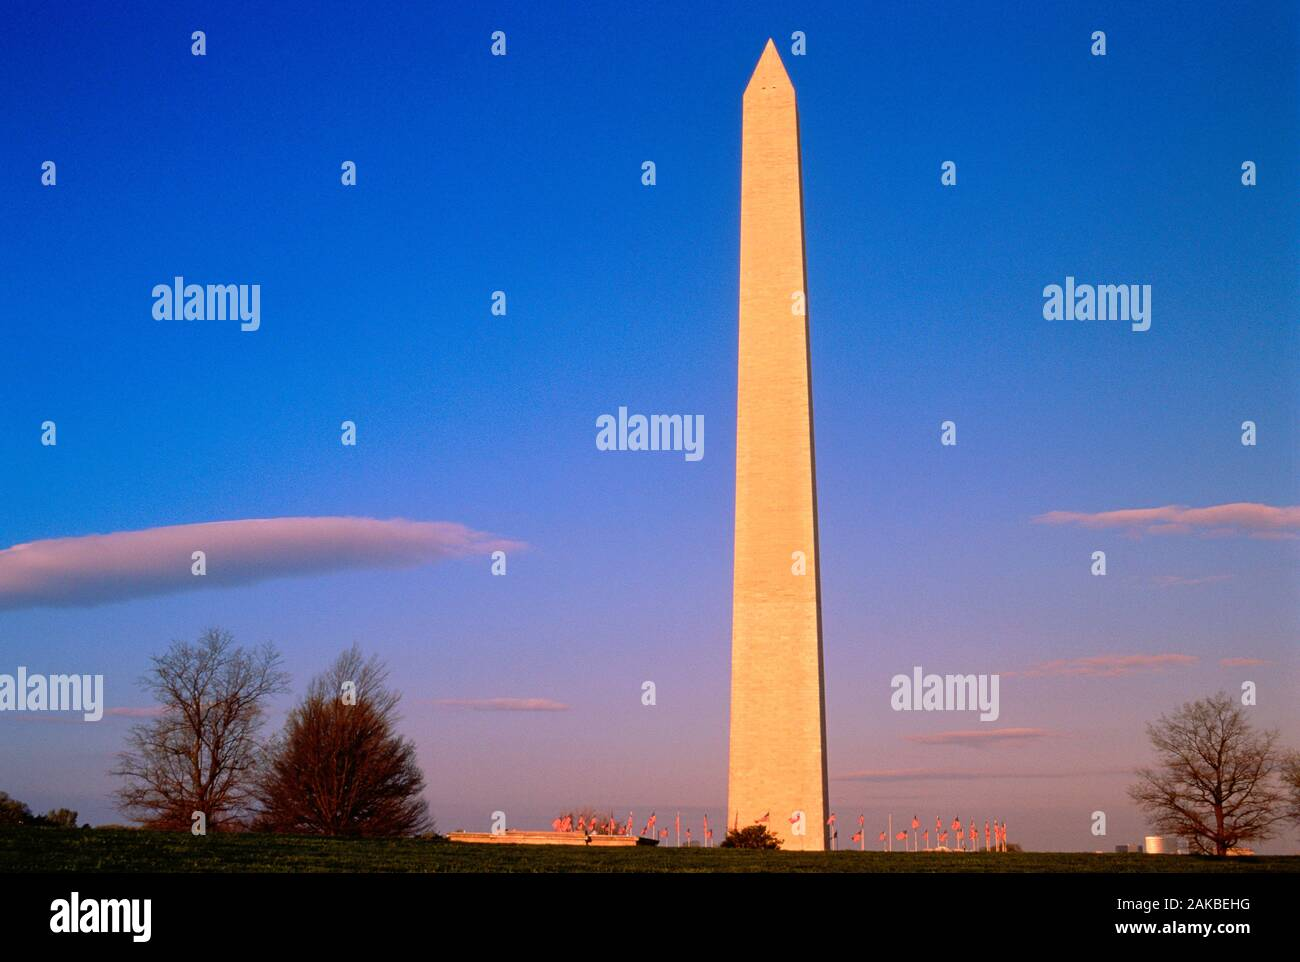 Il Monumento a Washington al tramonto, Washington DC, Stati Uniti d'America Foto Stock